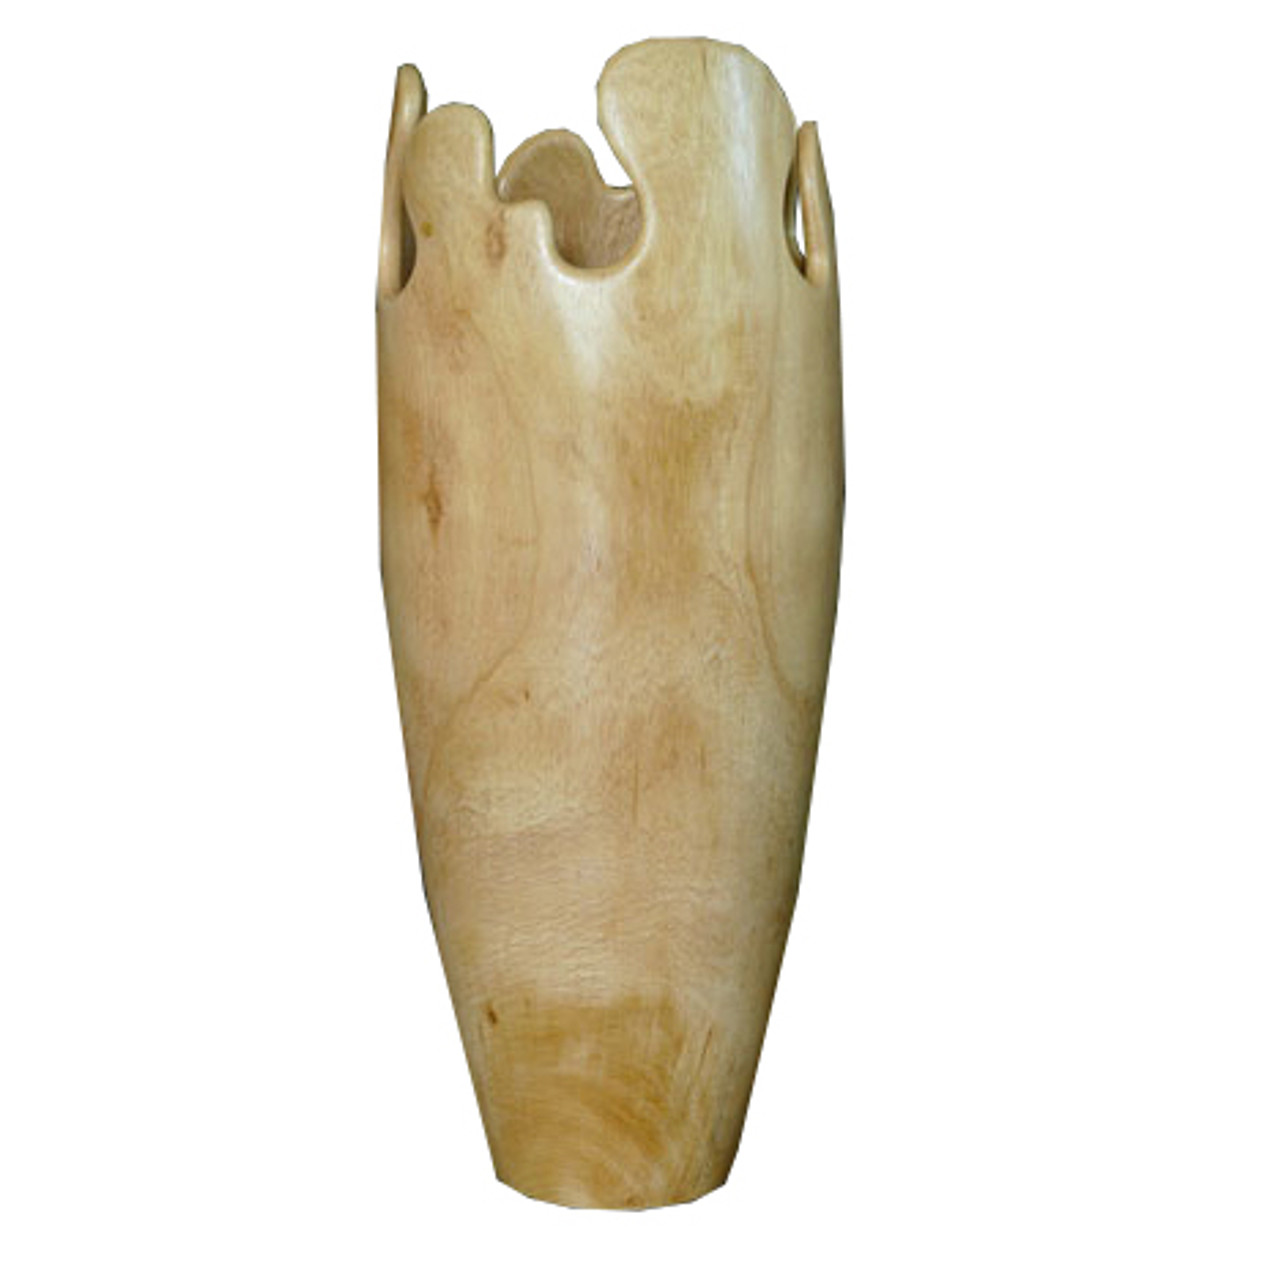 Tamarind Soft Vase - Natural Wood